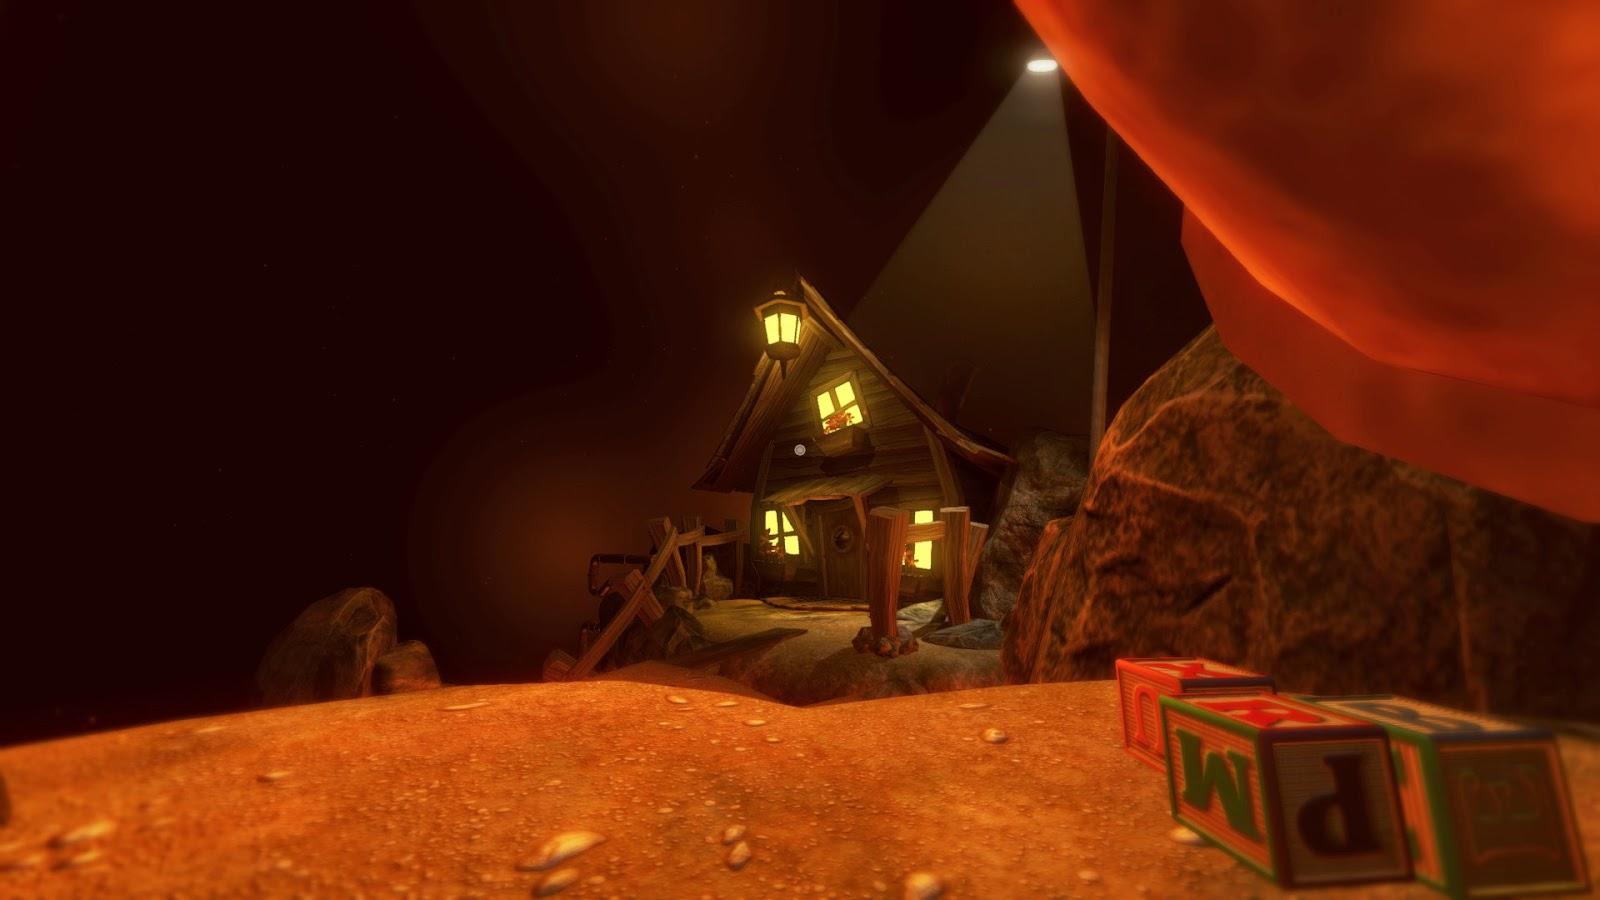 Among the sleep screenshot toy house